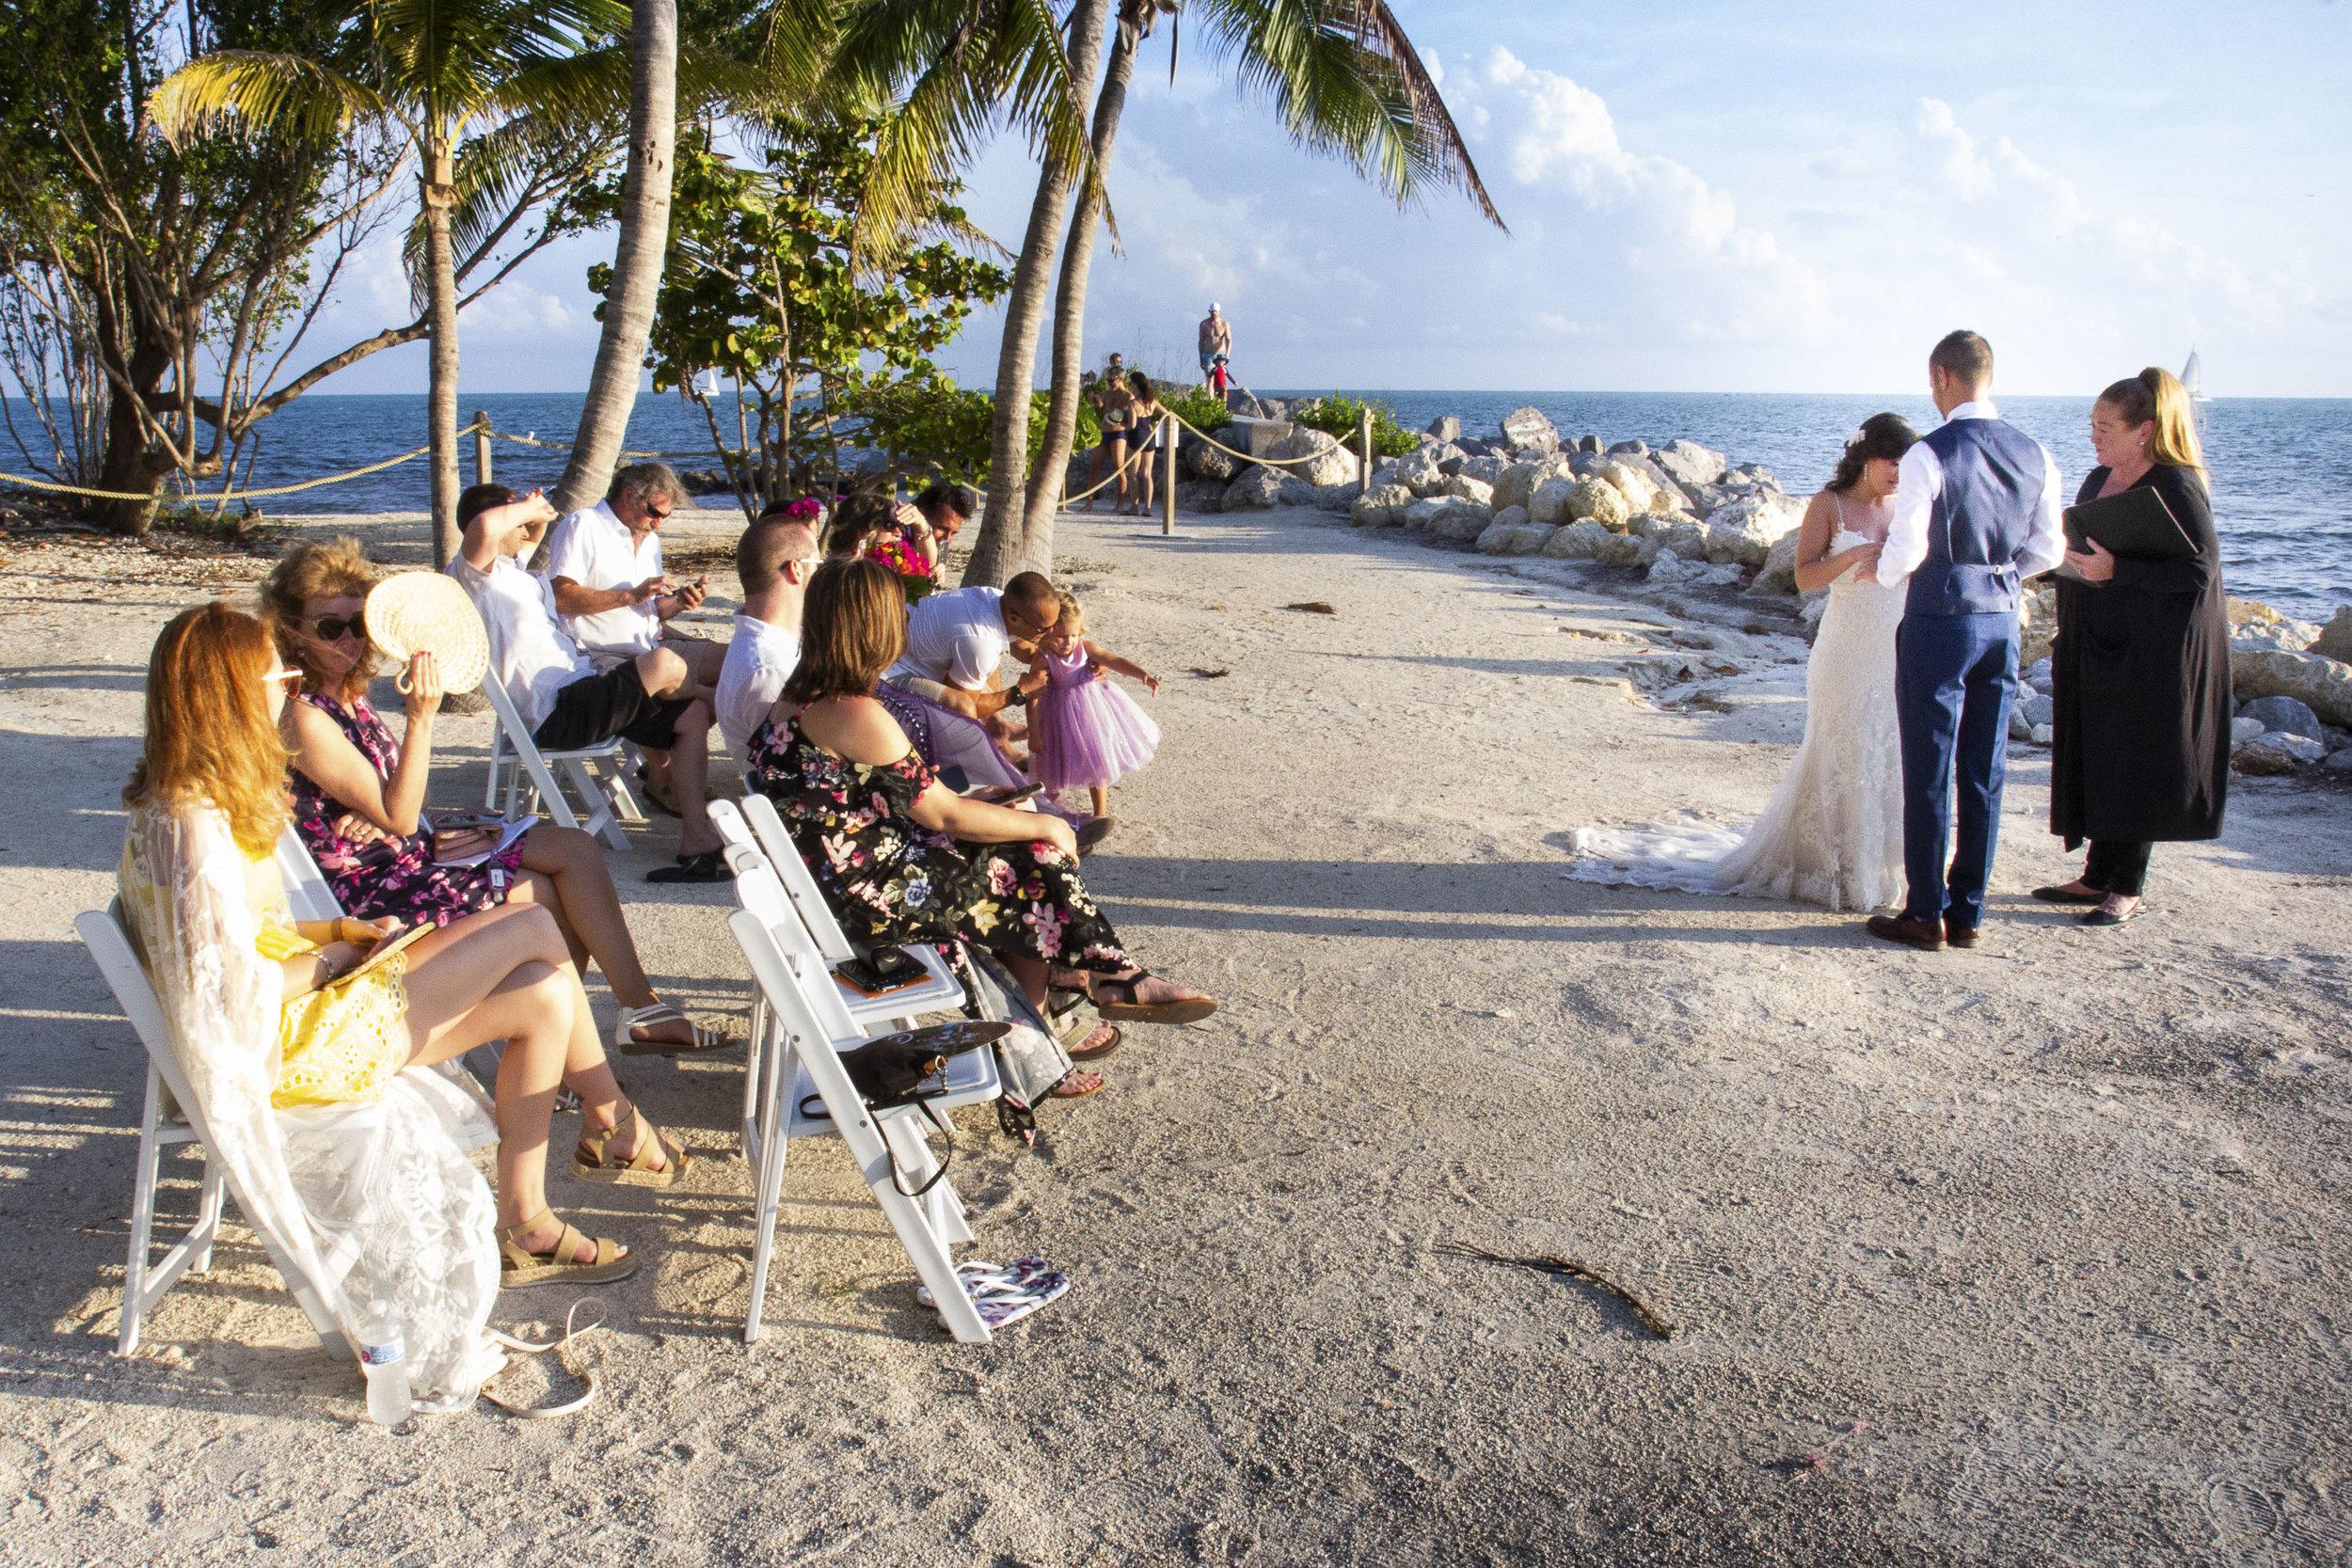 Celebration of a Key West wedding